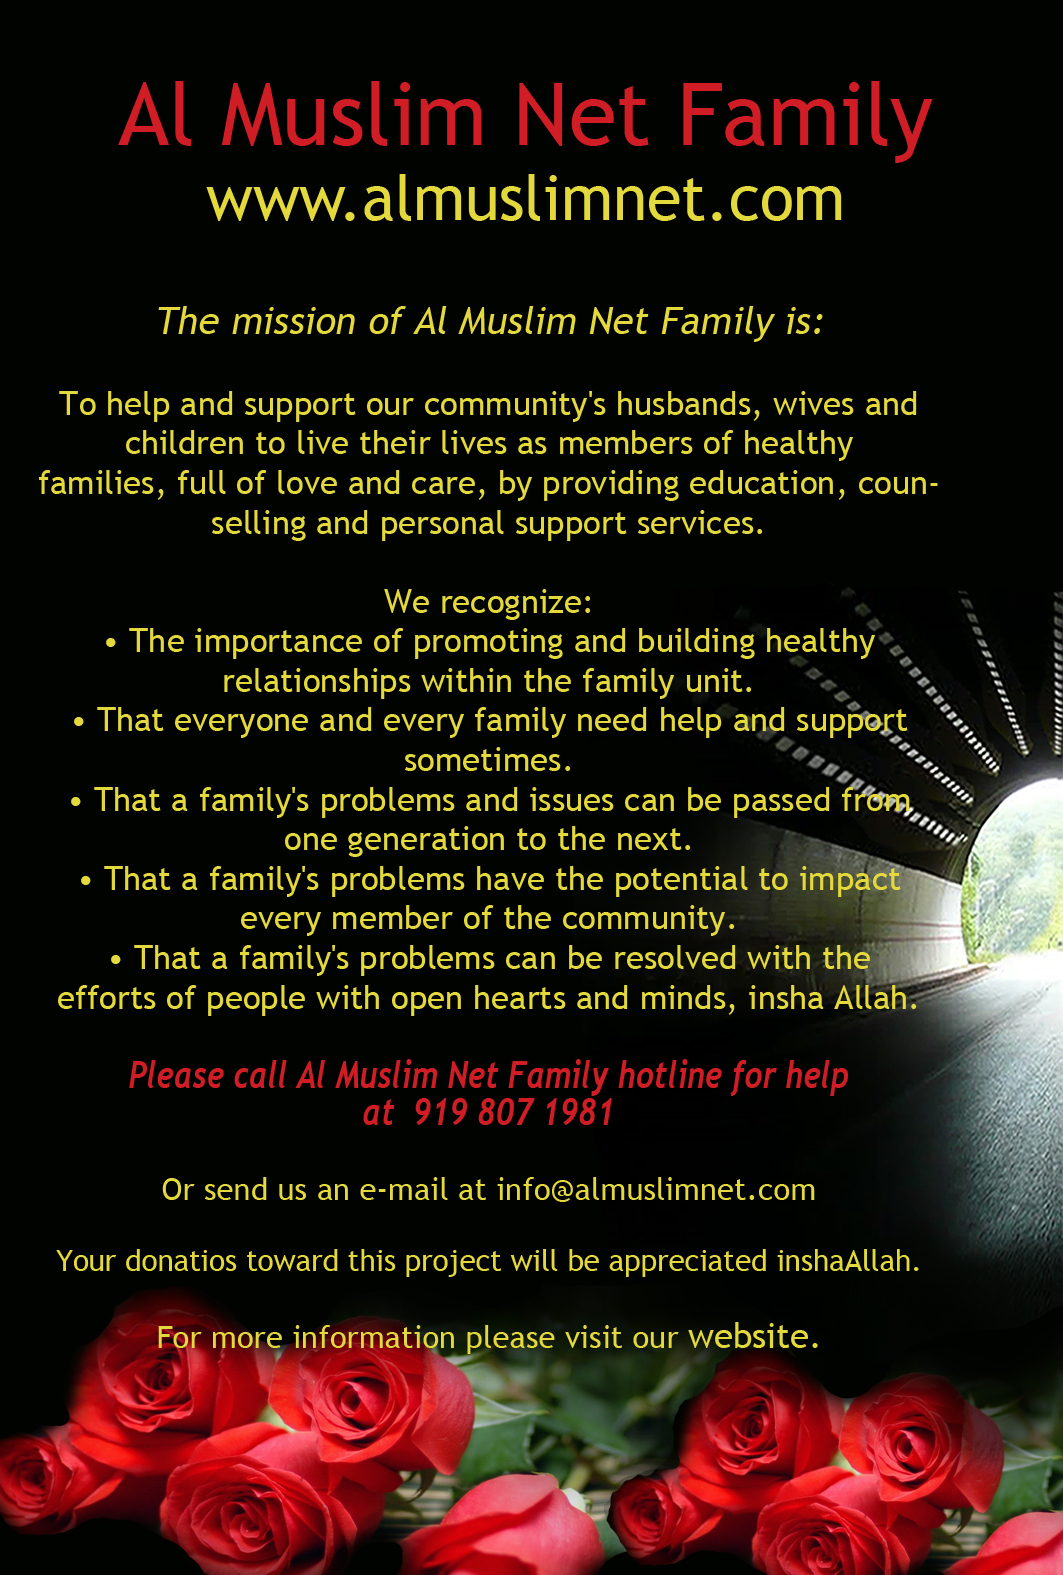 almsuslim-family